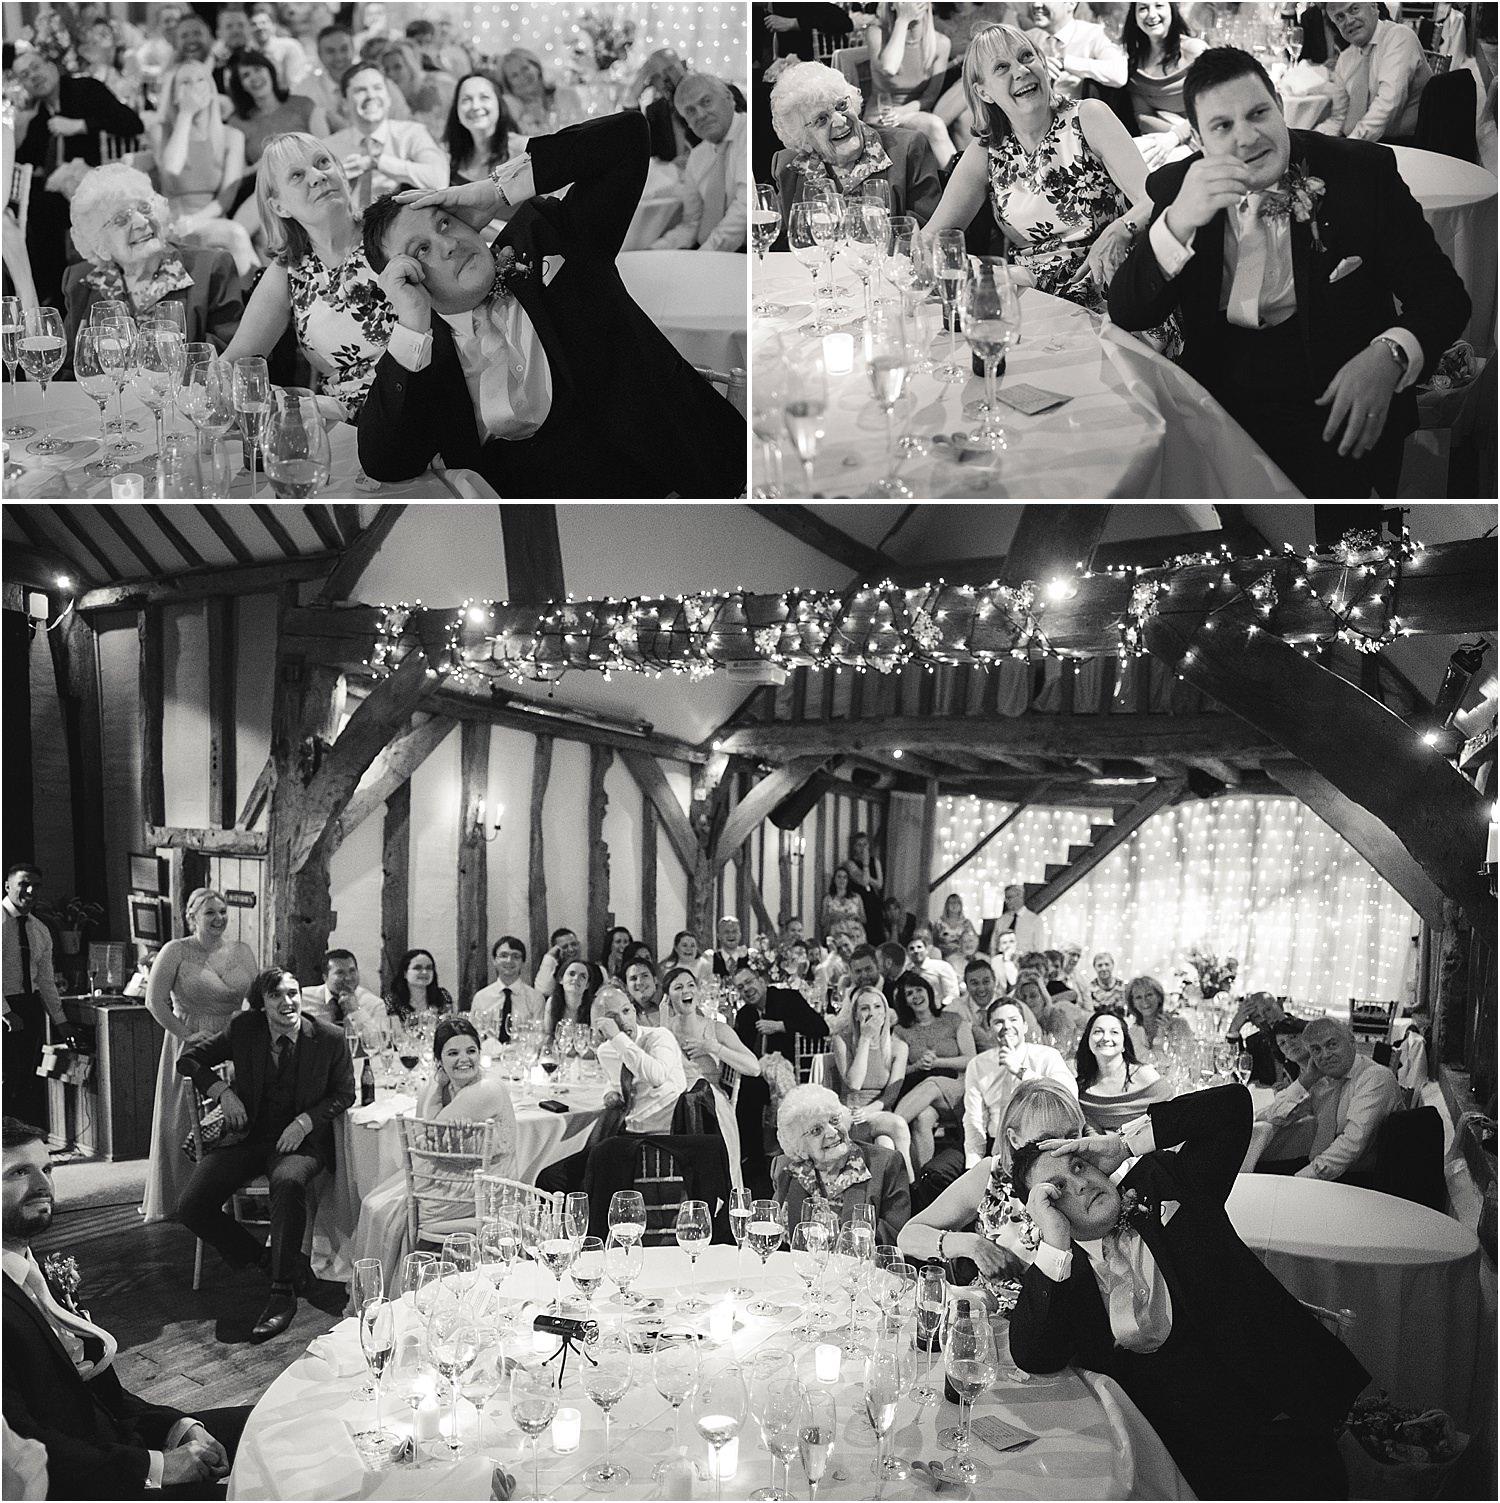 Old Luxters Barn Wedding Venue Henley On Thames: Old Luxters Barn Wedding Photographer